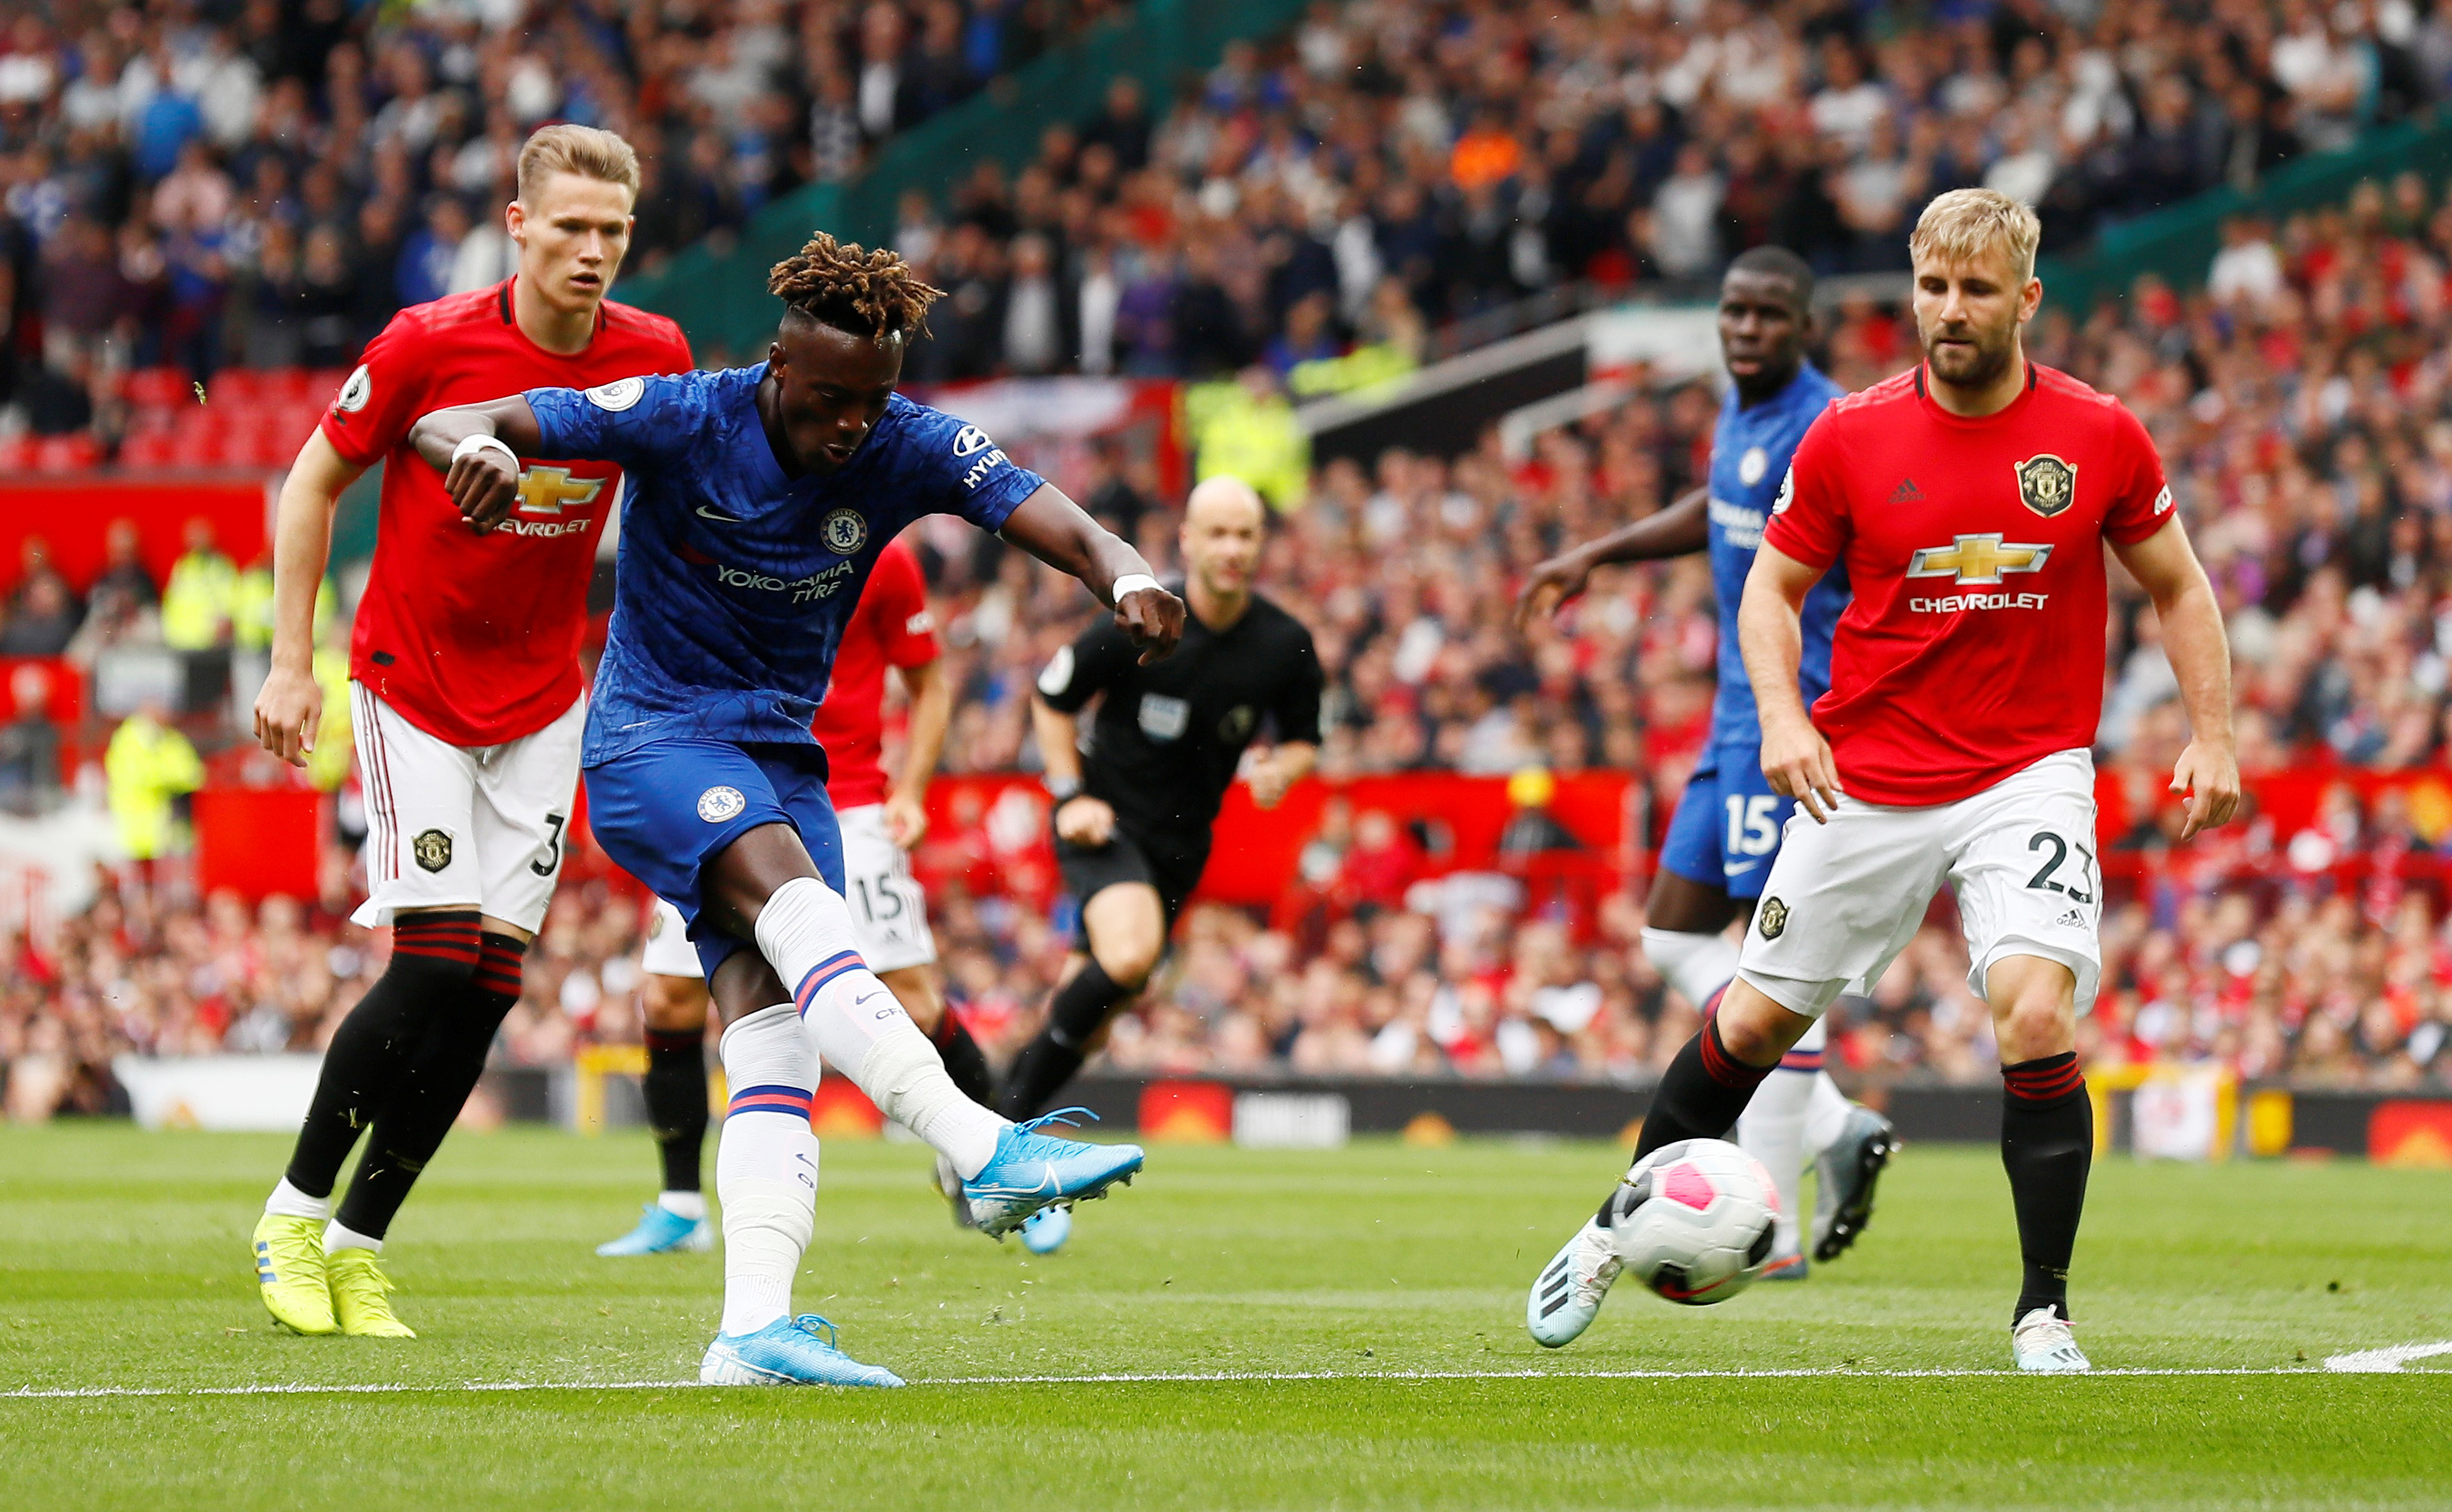 Chelsea v Man Utd: Top-four rivals go head-to-head